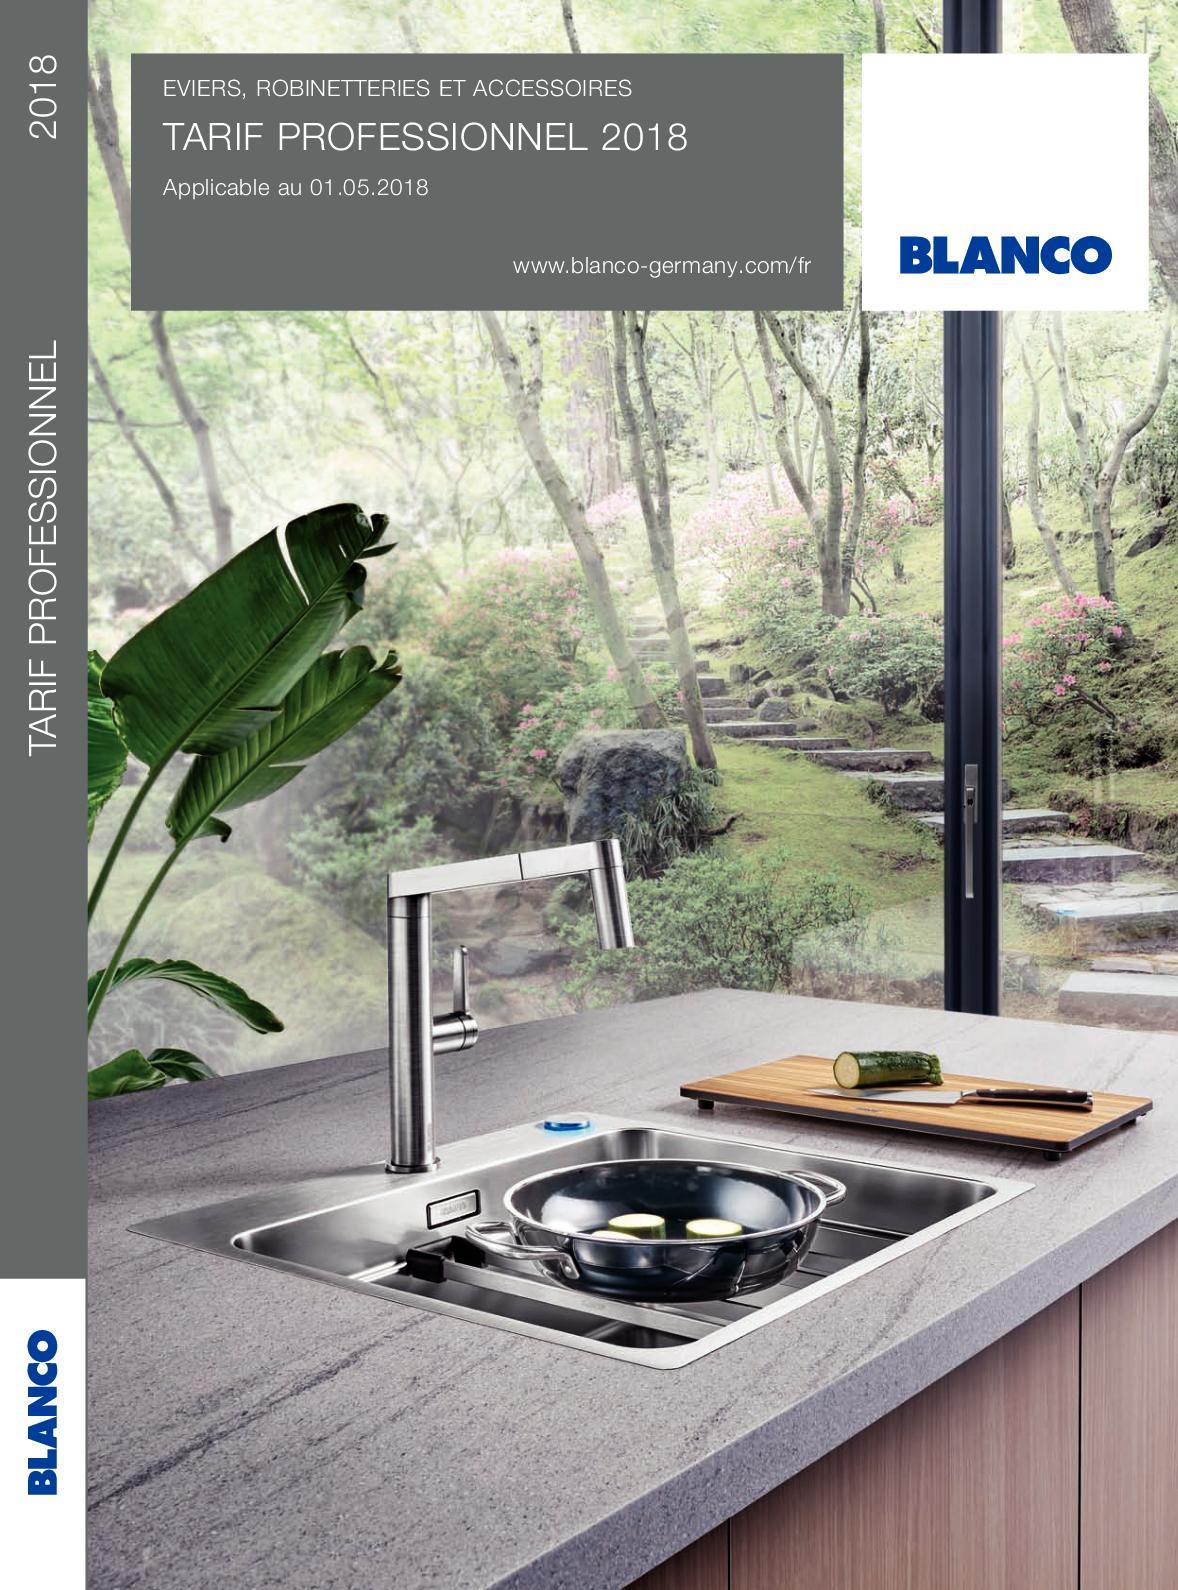 Blanco Encastrable 513214 Blancometra 5 S Silgranit/® PuraDur/® II Blanc /Évier 45 cm